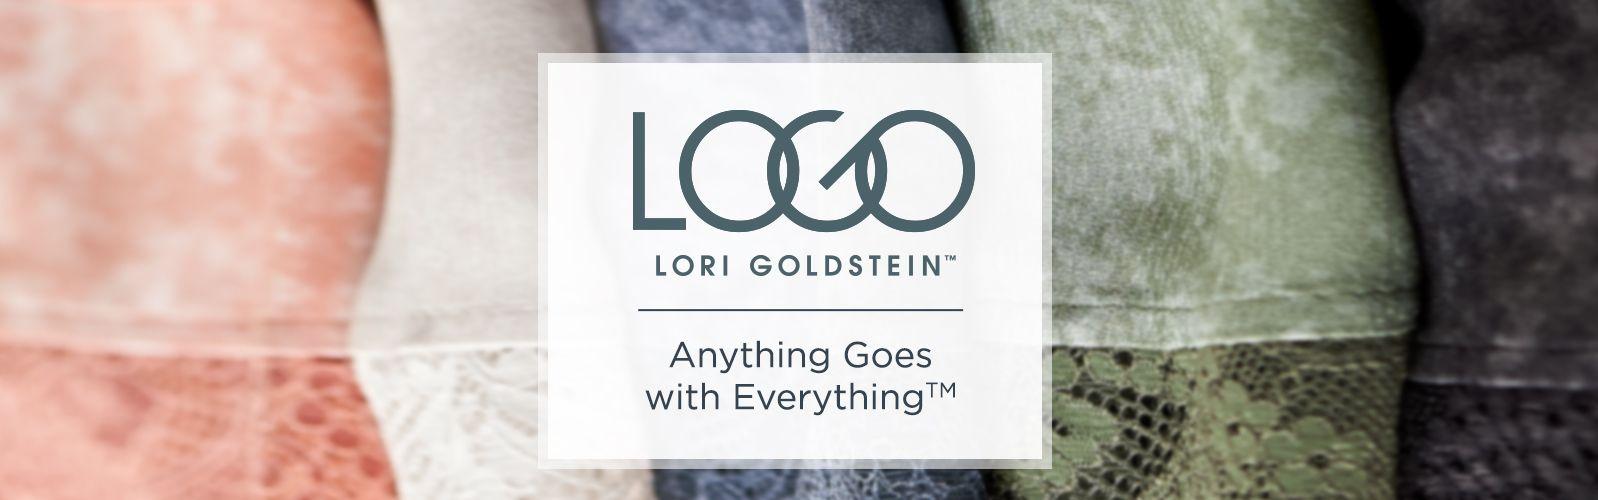 LOGO by Lori Goldstein — Shoes - QVC.com